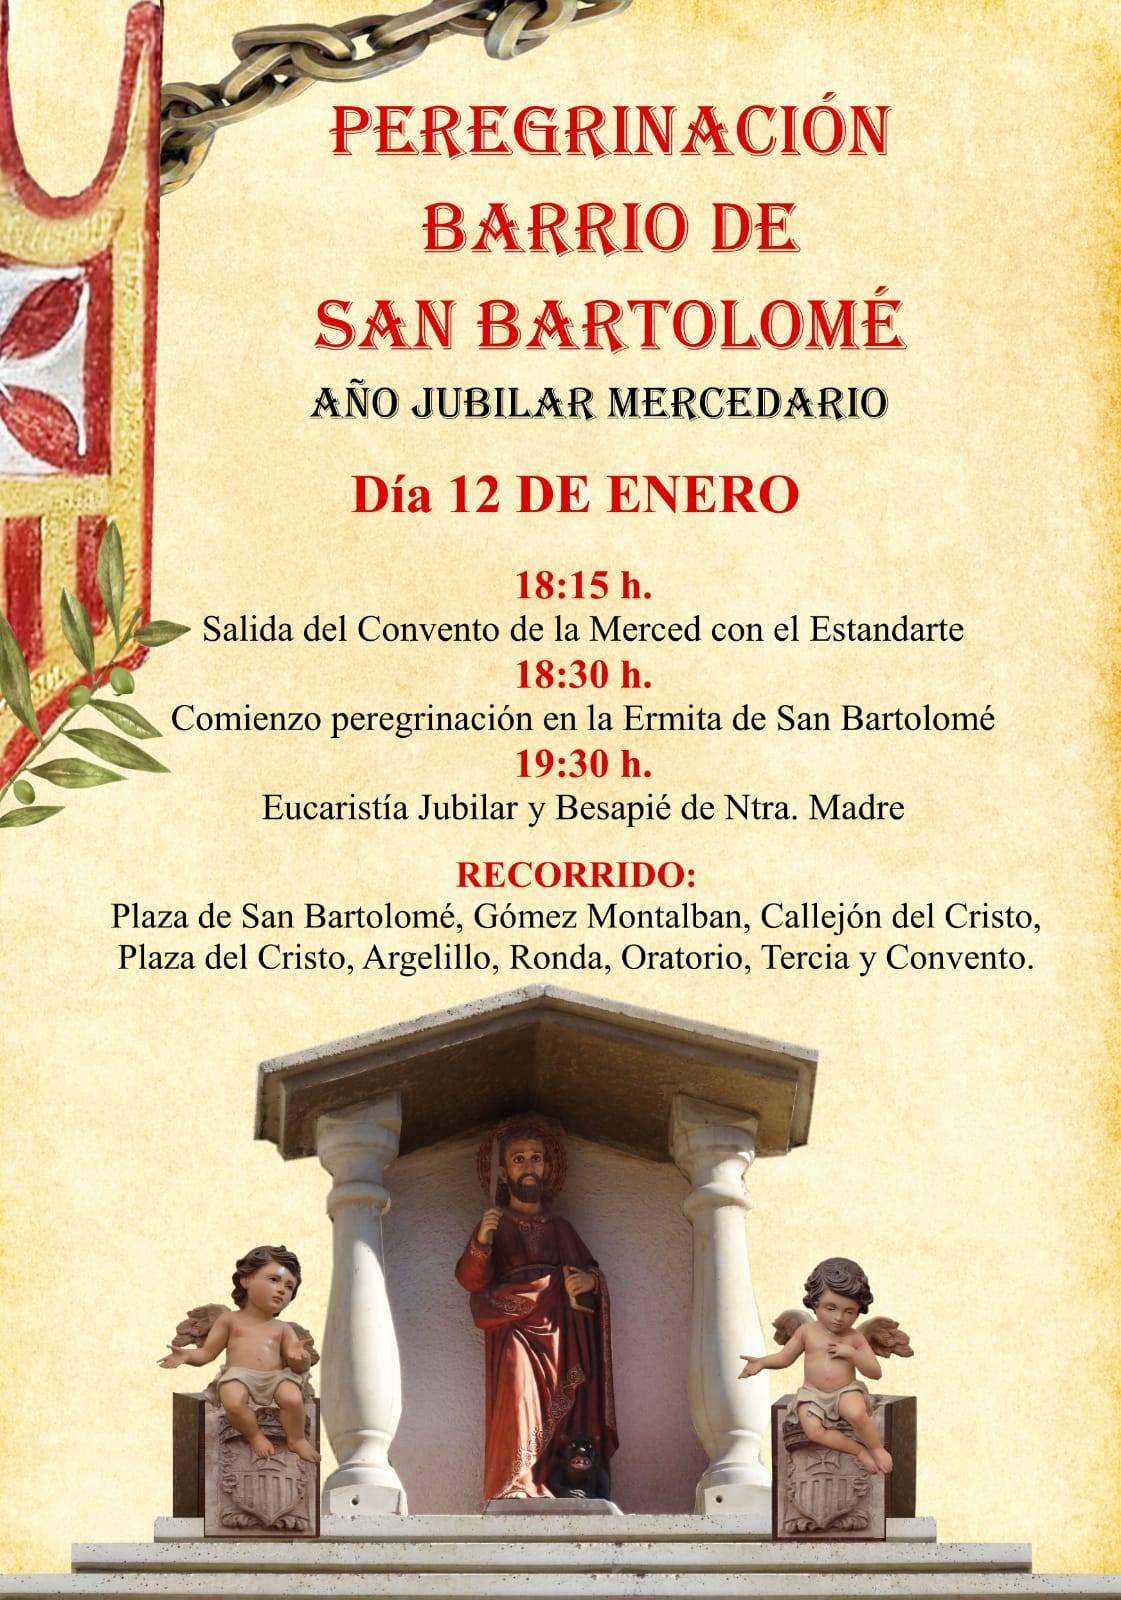 Peregrinación jubilar mercedaria del barrio de San Bartolomé 3